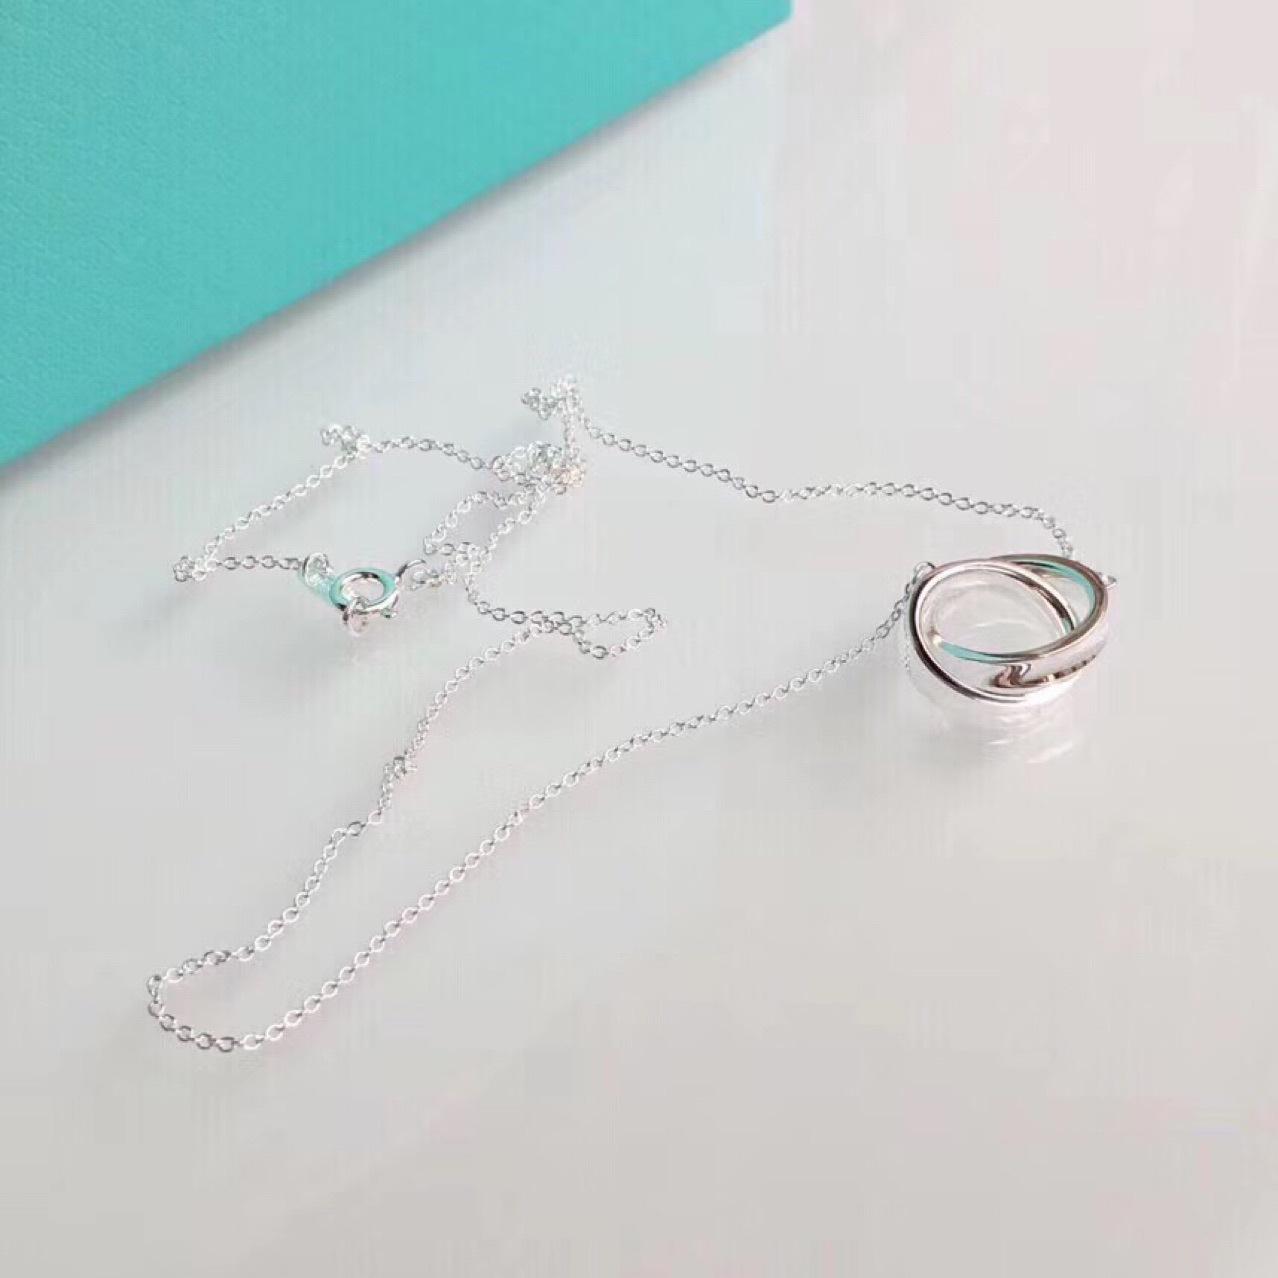 t家1837双环双圈项链925纯银女锁骨项链一件代发